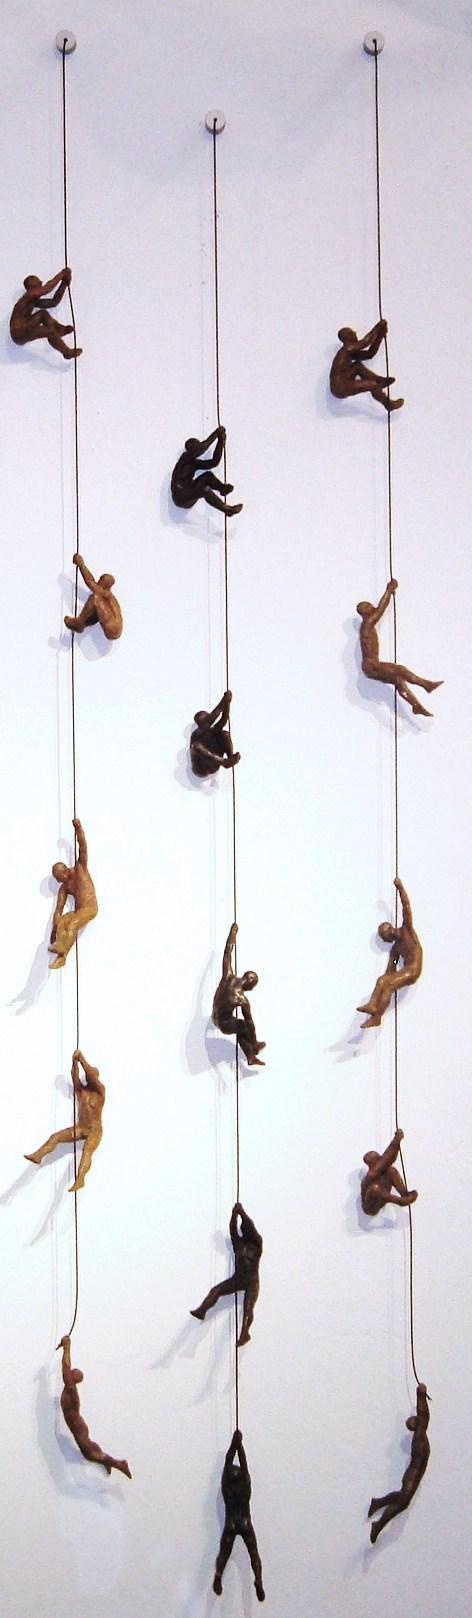 Rope Climbers